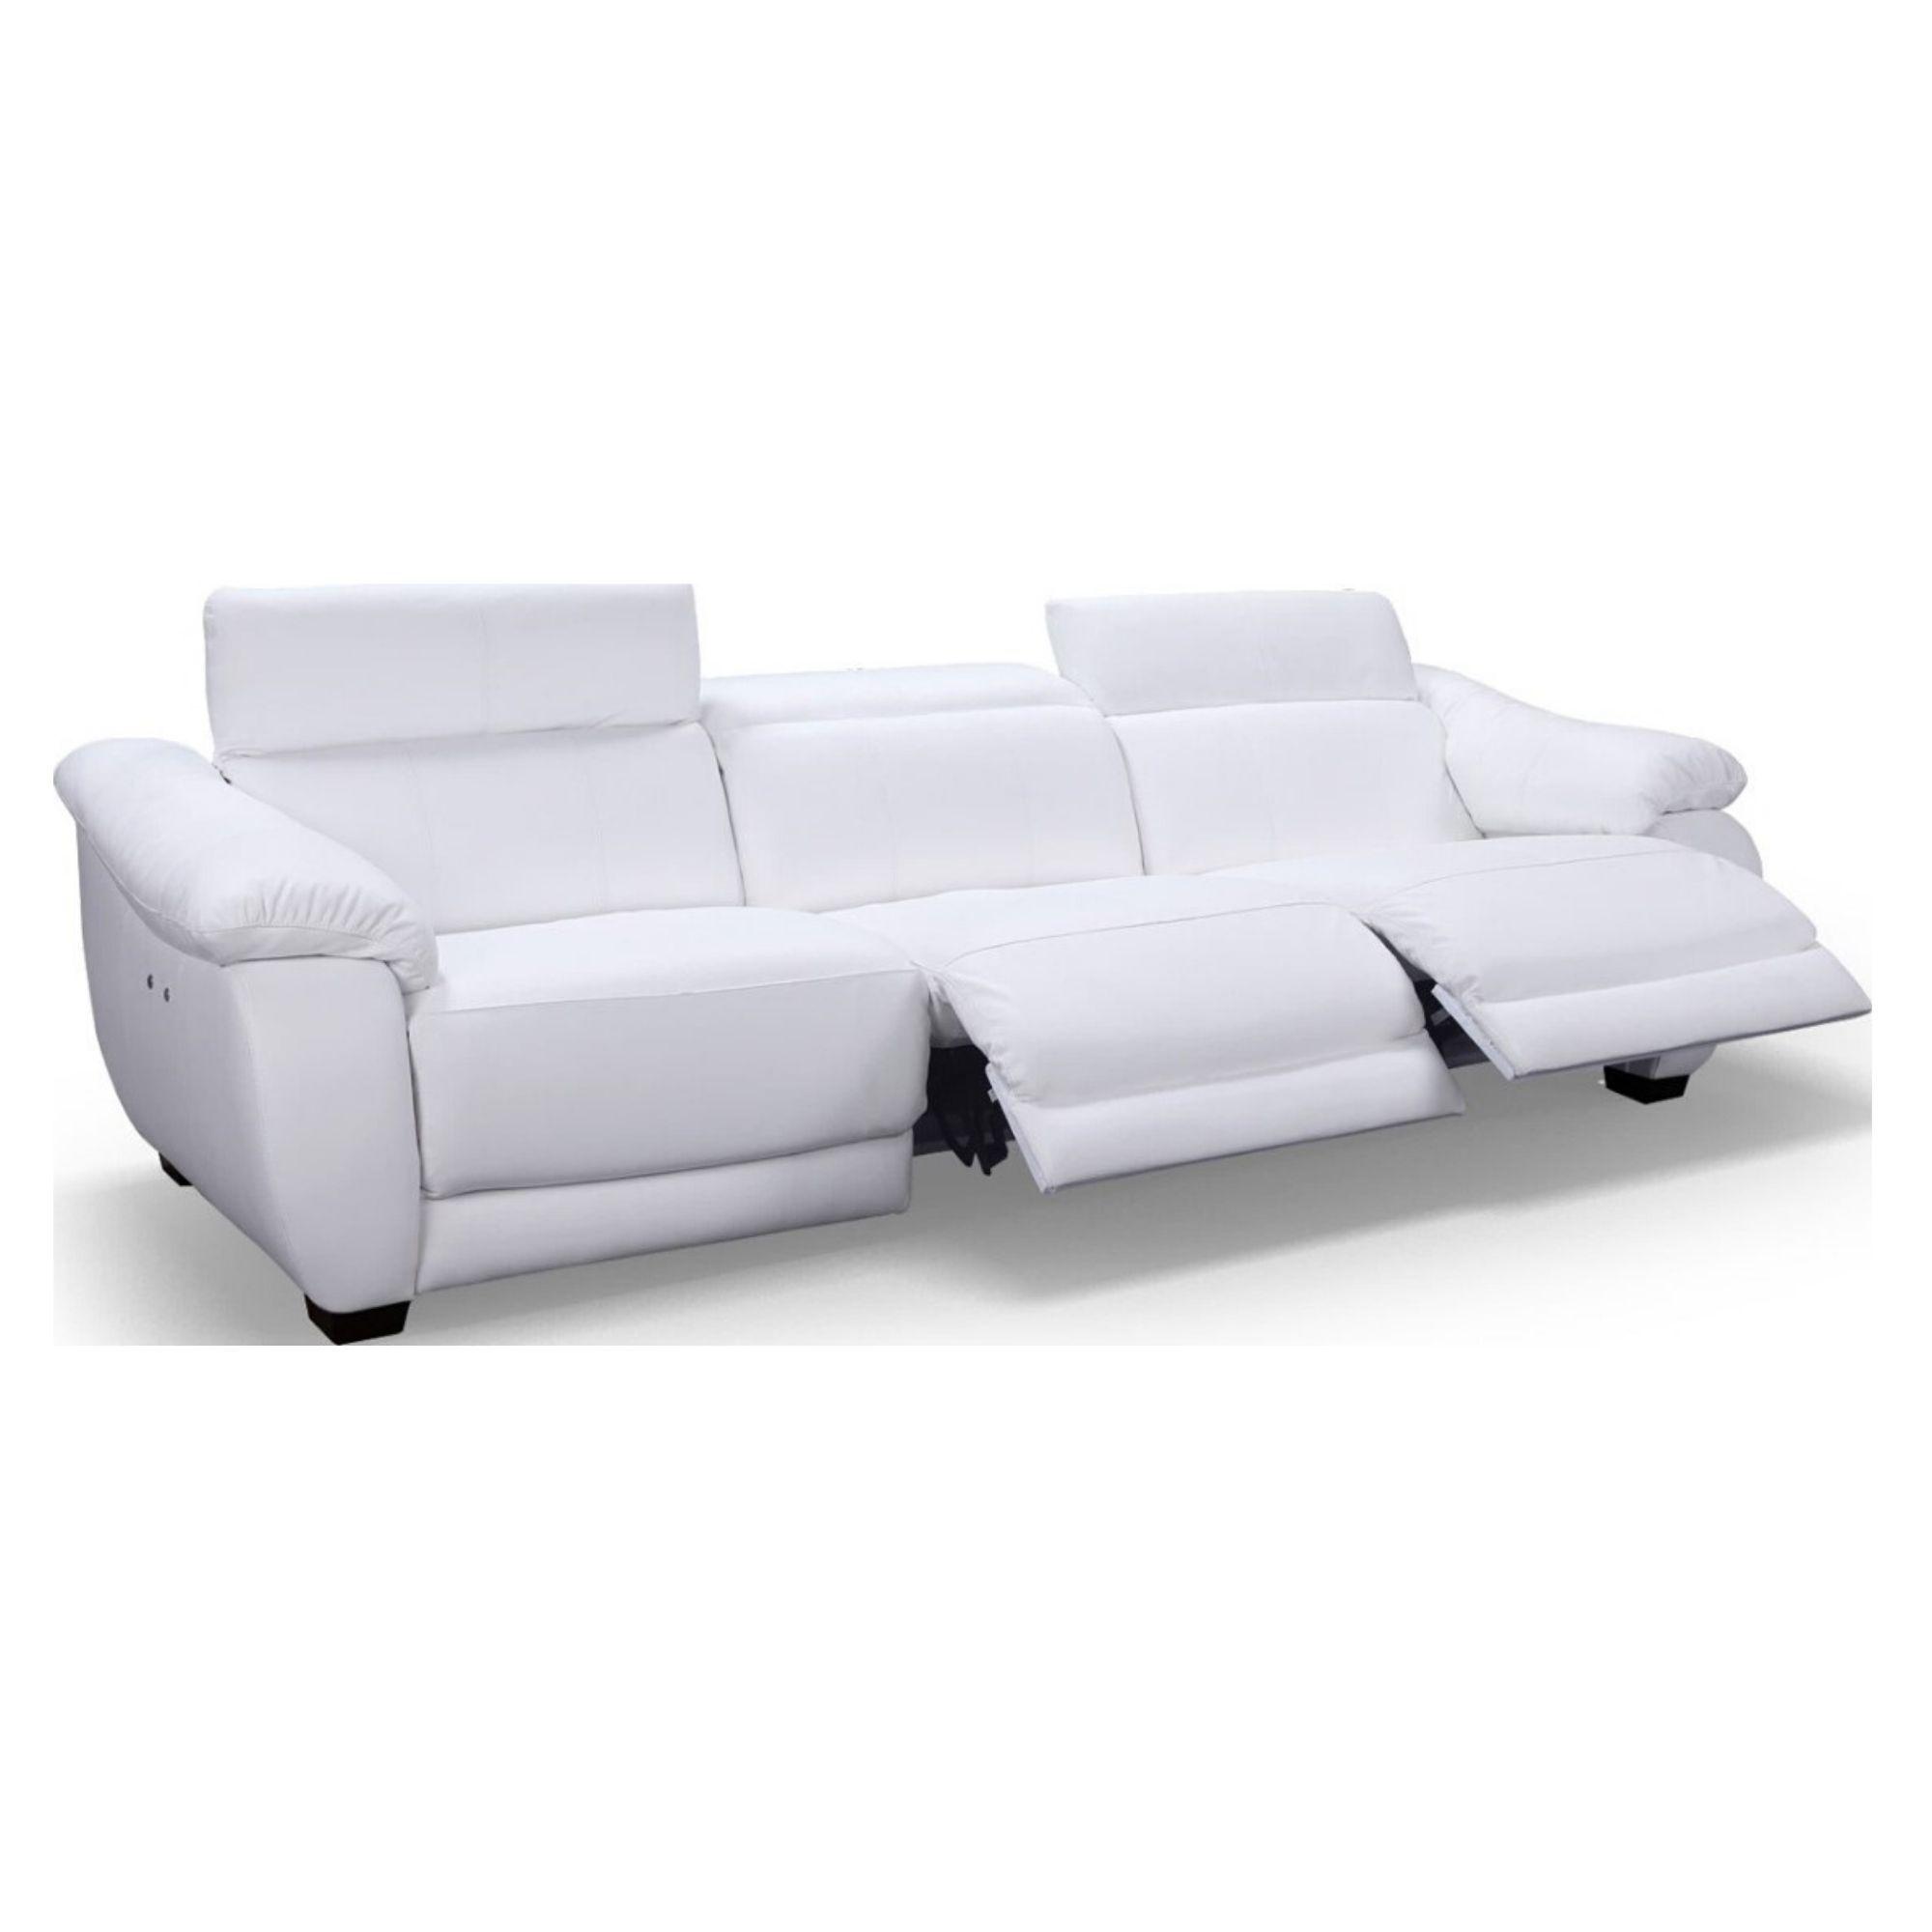 Sofá Retrátil Elétrico de Couro 3 Lugares 344 cm - Royal Branco